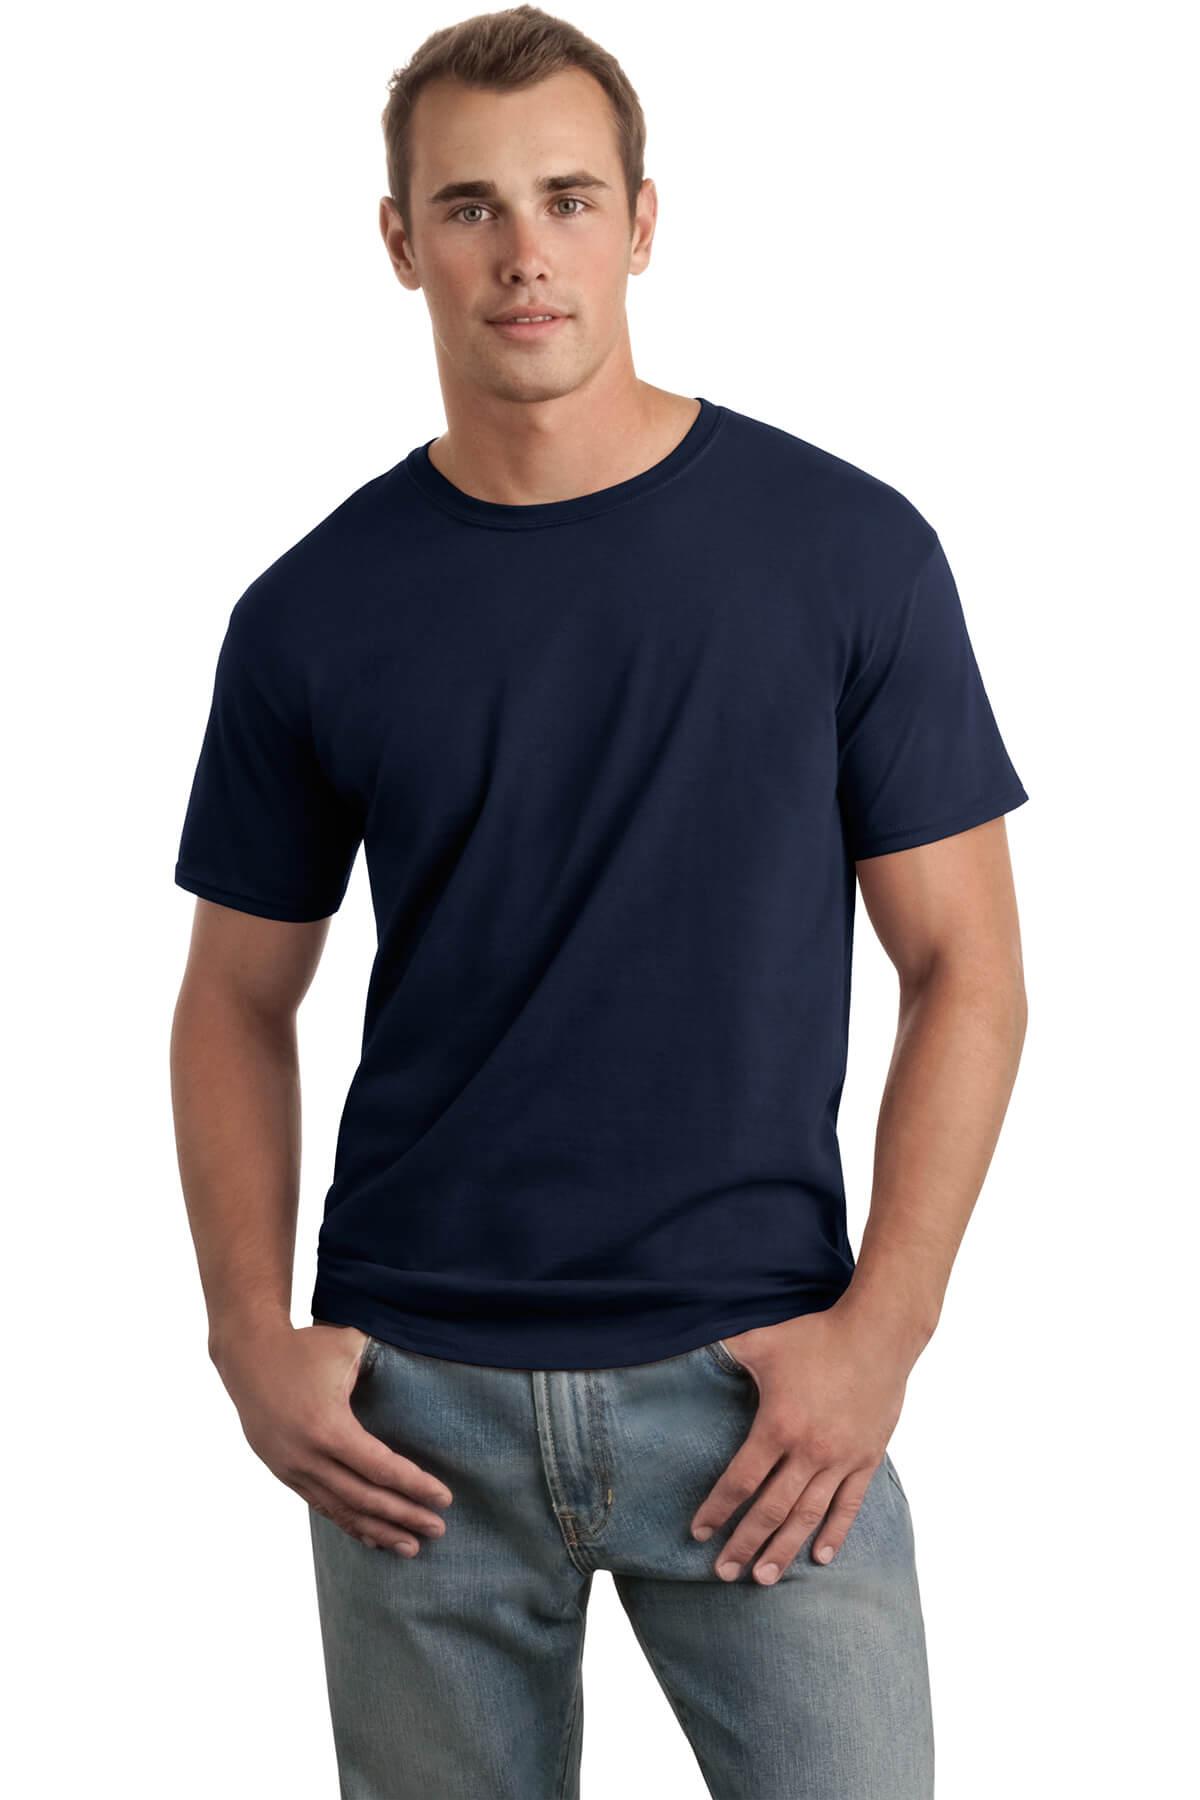 Navy T-Shirt Model Front